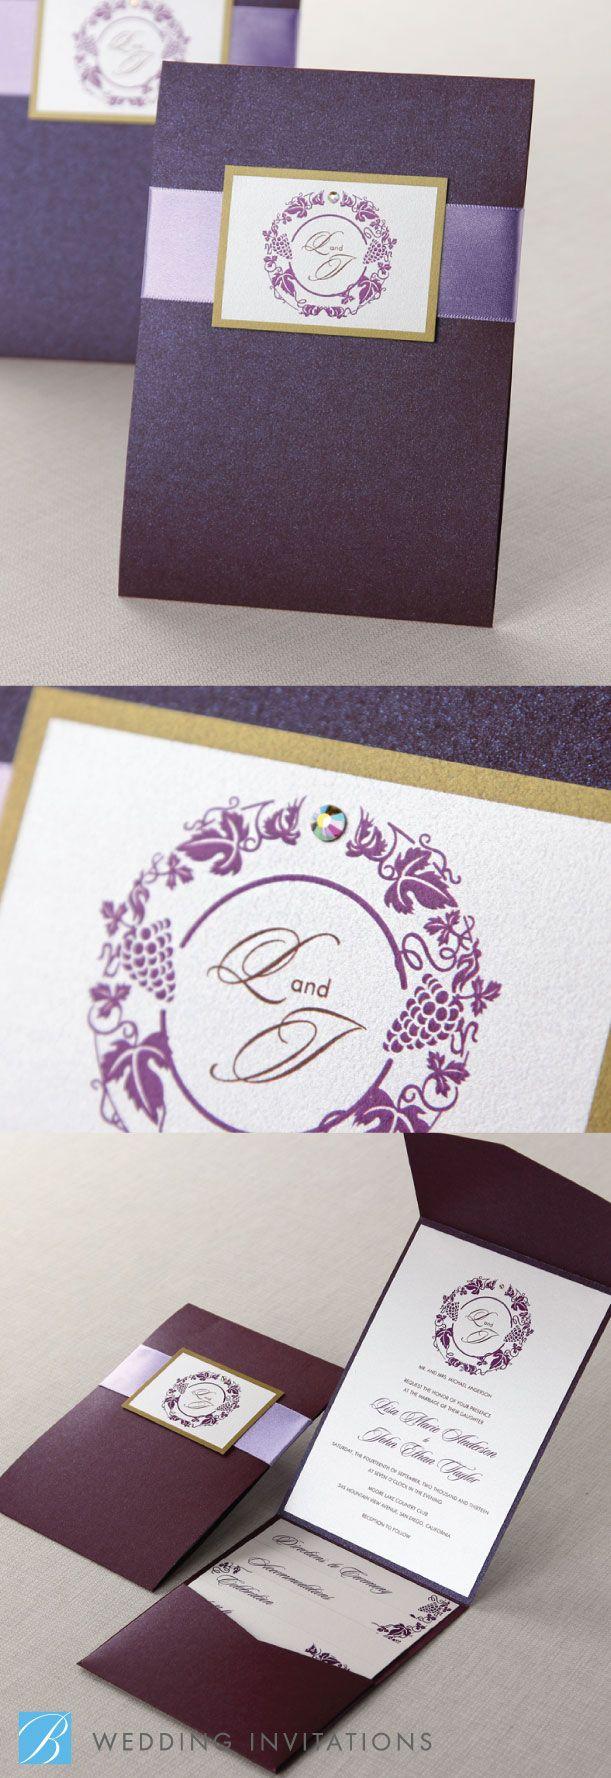 Grapevine Wreath I by B Wedding Invitations #wedding #invitations #weddinginvitations #bweddinginvitations #pocket #pocketinvitation #purple #purpleinvitation #grapevine #vineyard #winery #wreath